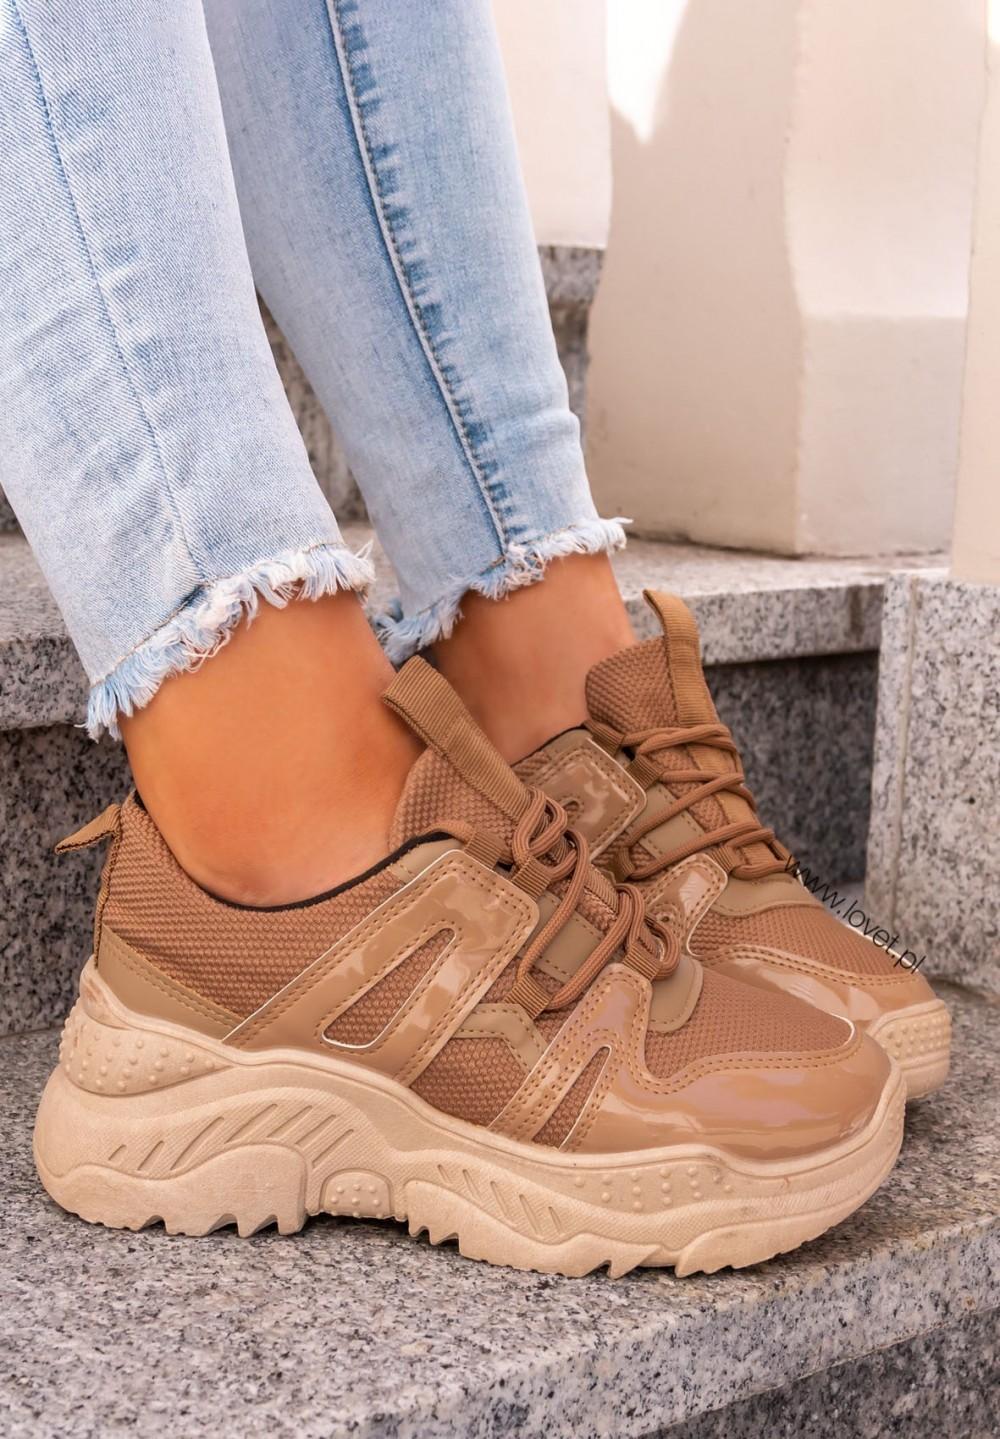 Trampki Sneakersy Beżowe Camella